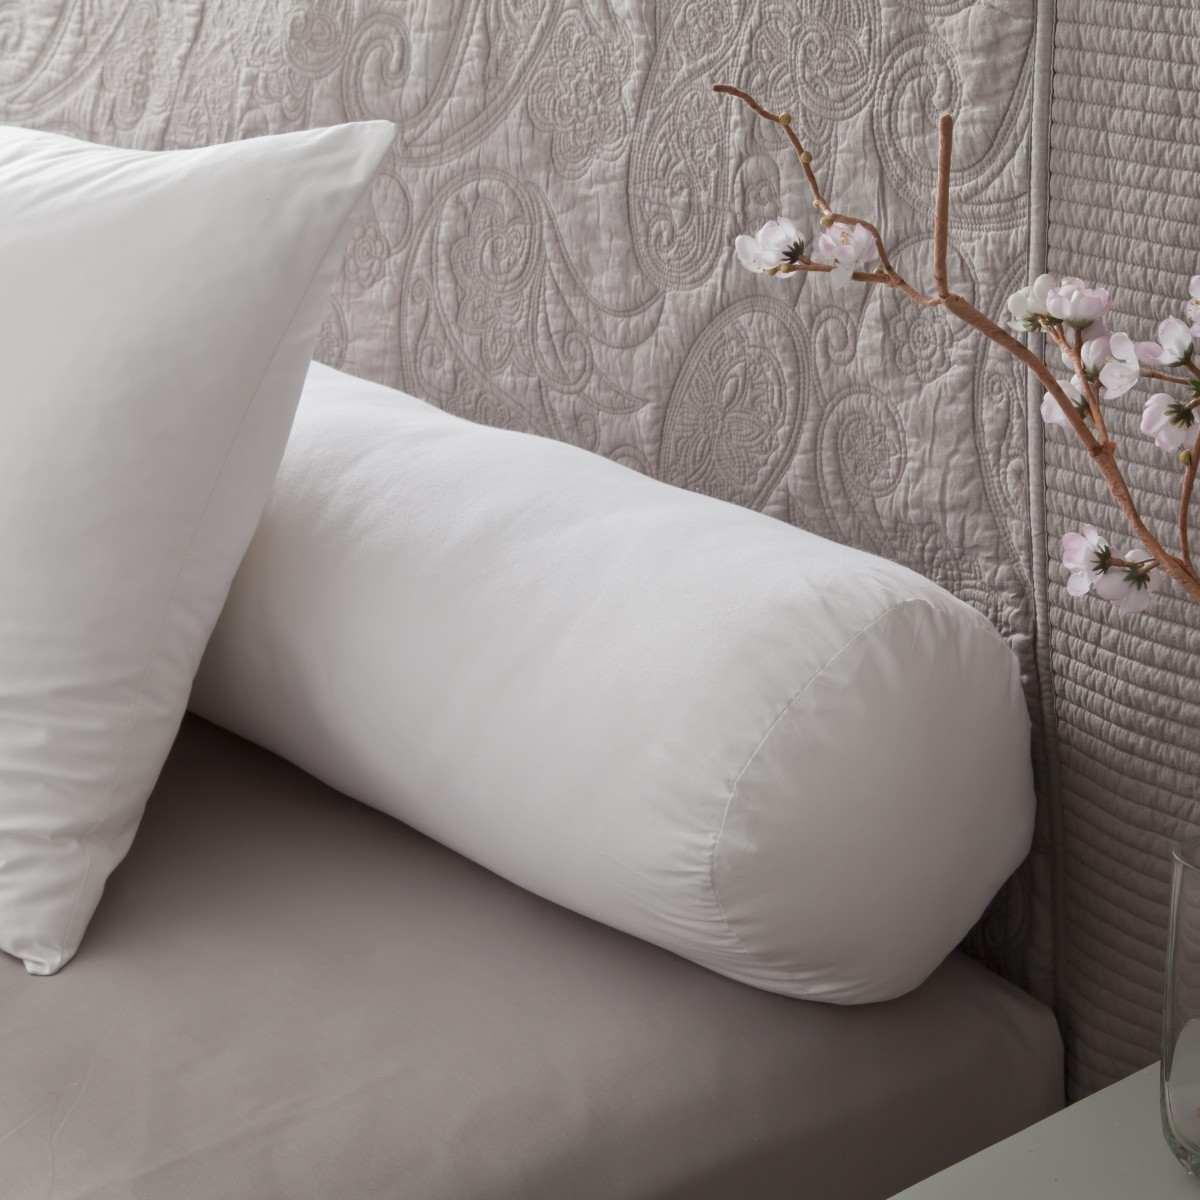 linge de lit traversin Traversin Quallofil Allerban | Traversin 160 | Tradition des Vosges linge de lit traversin